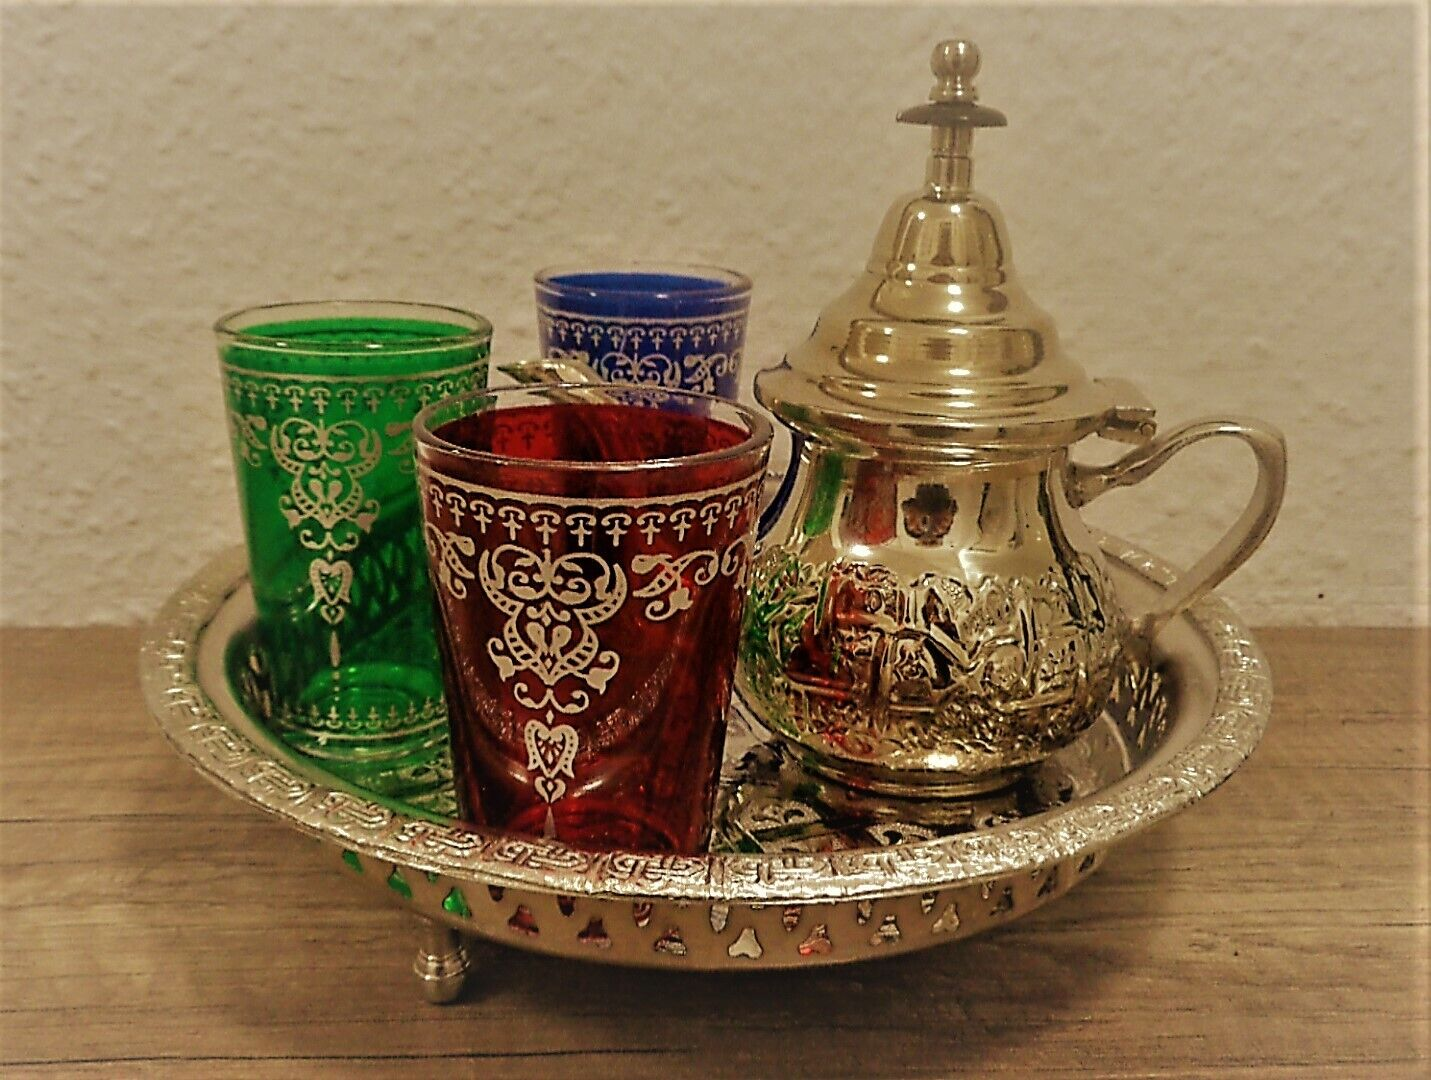 Orientalischer Teeservice 3 Gläser Serviertablett+Teekanne+Teegläser Teeset SIF